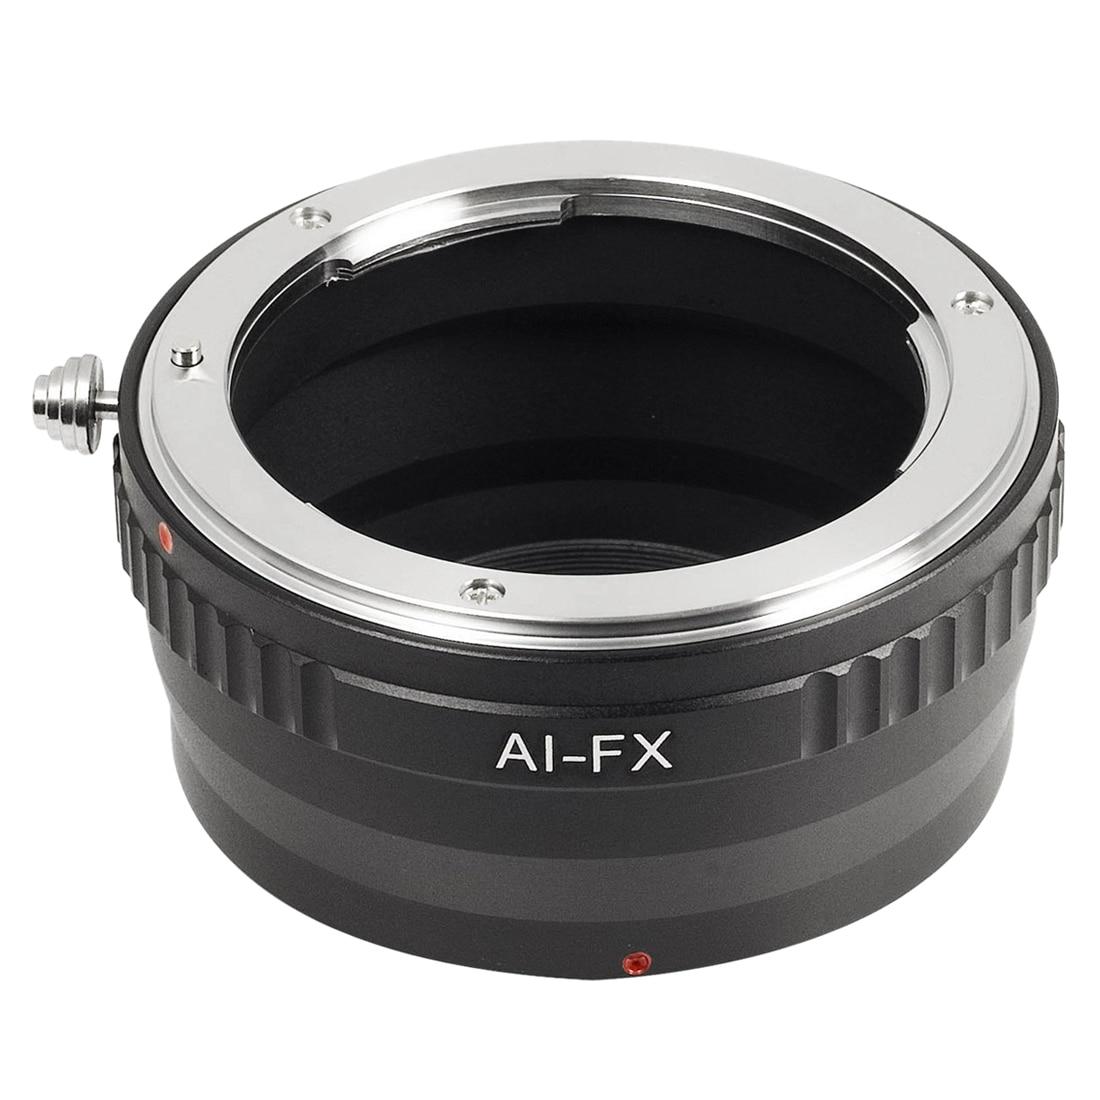 Black Lens Adapter For Nikon F AI Lens to Fujifilm X Mount Camera Fit Fuji X-E1 DC287